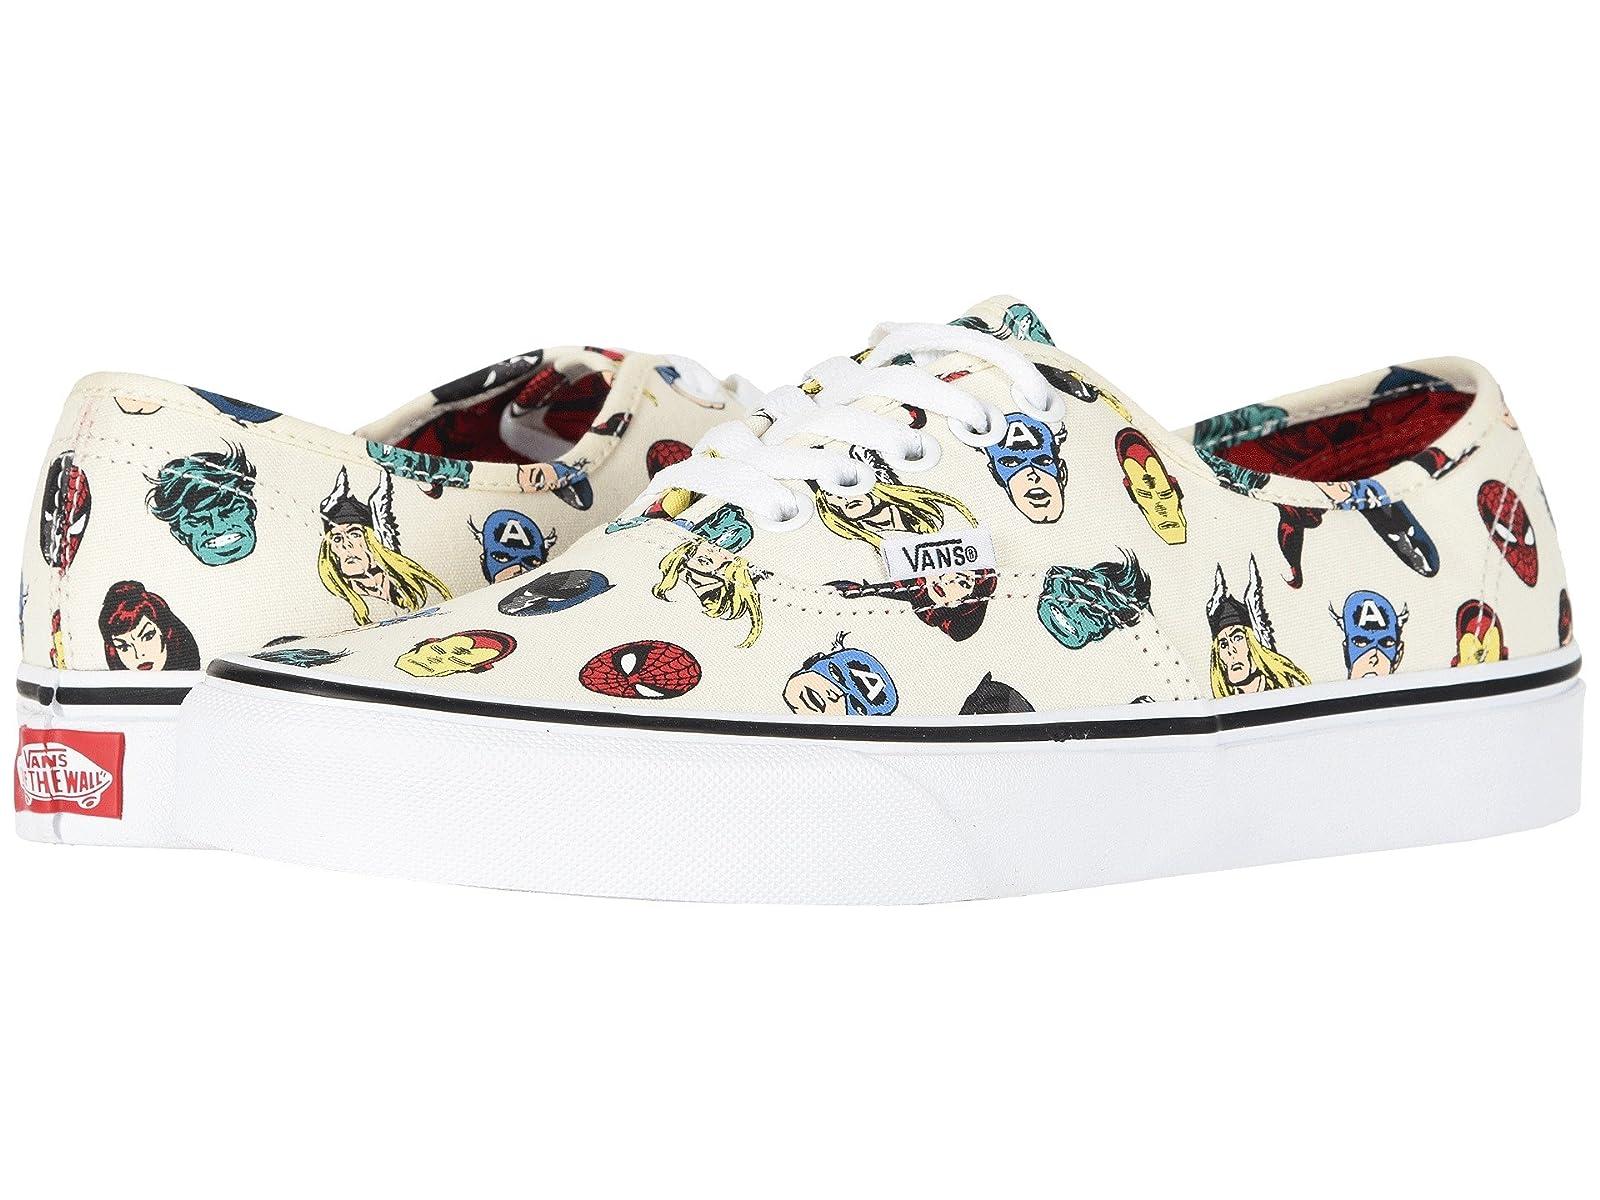 Vans Authentic X Marvel CollabAtmospheric grades have affordable shoes